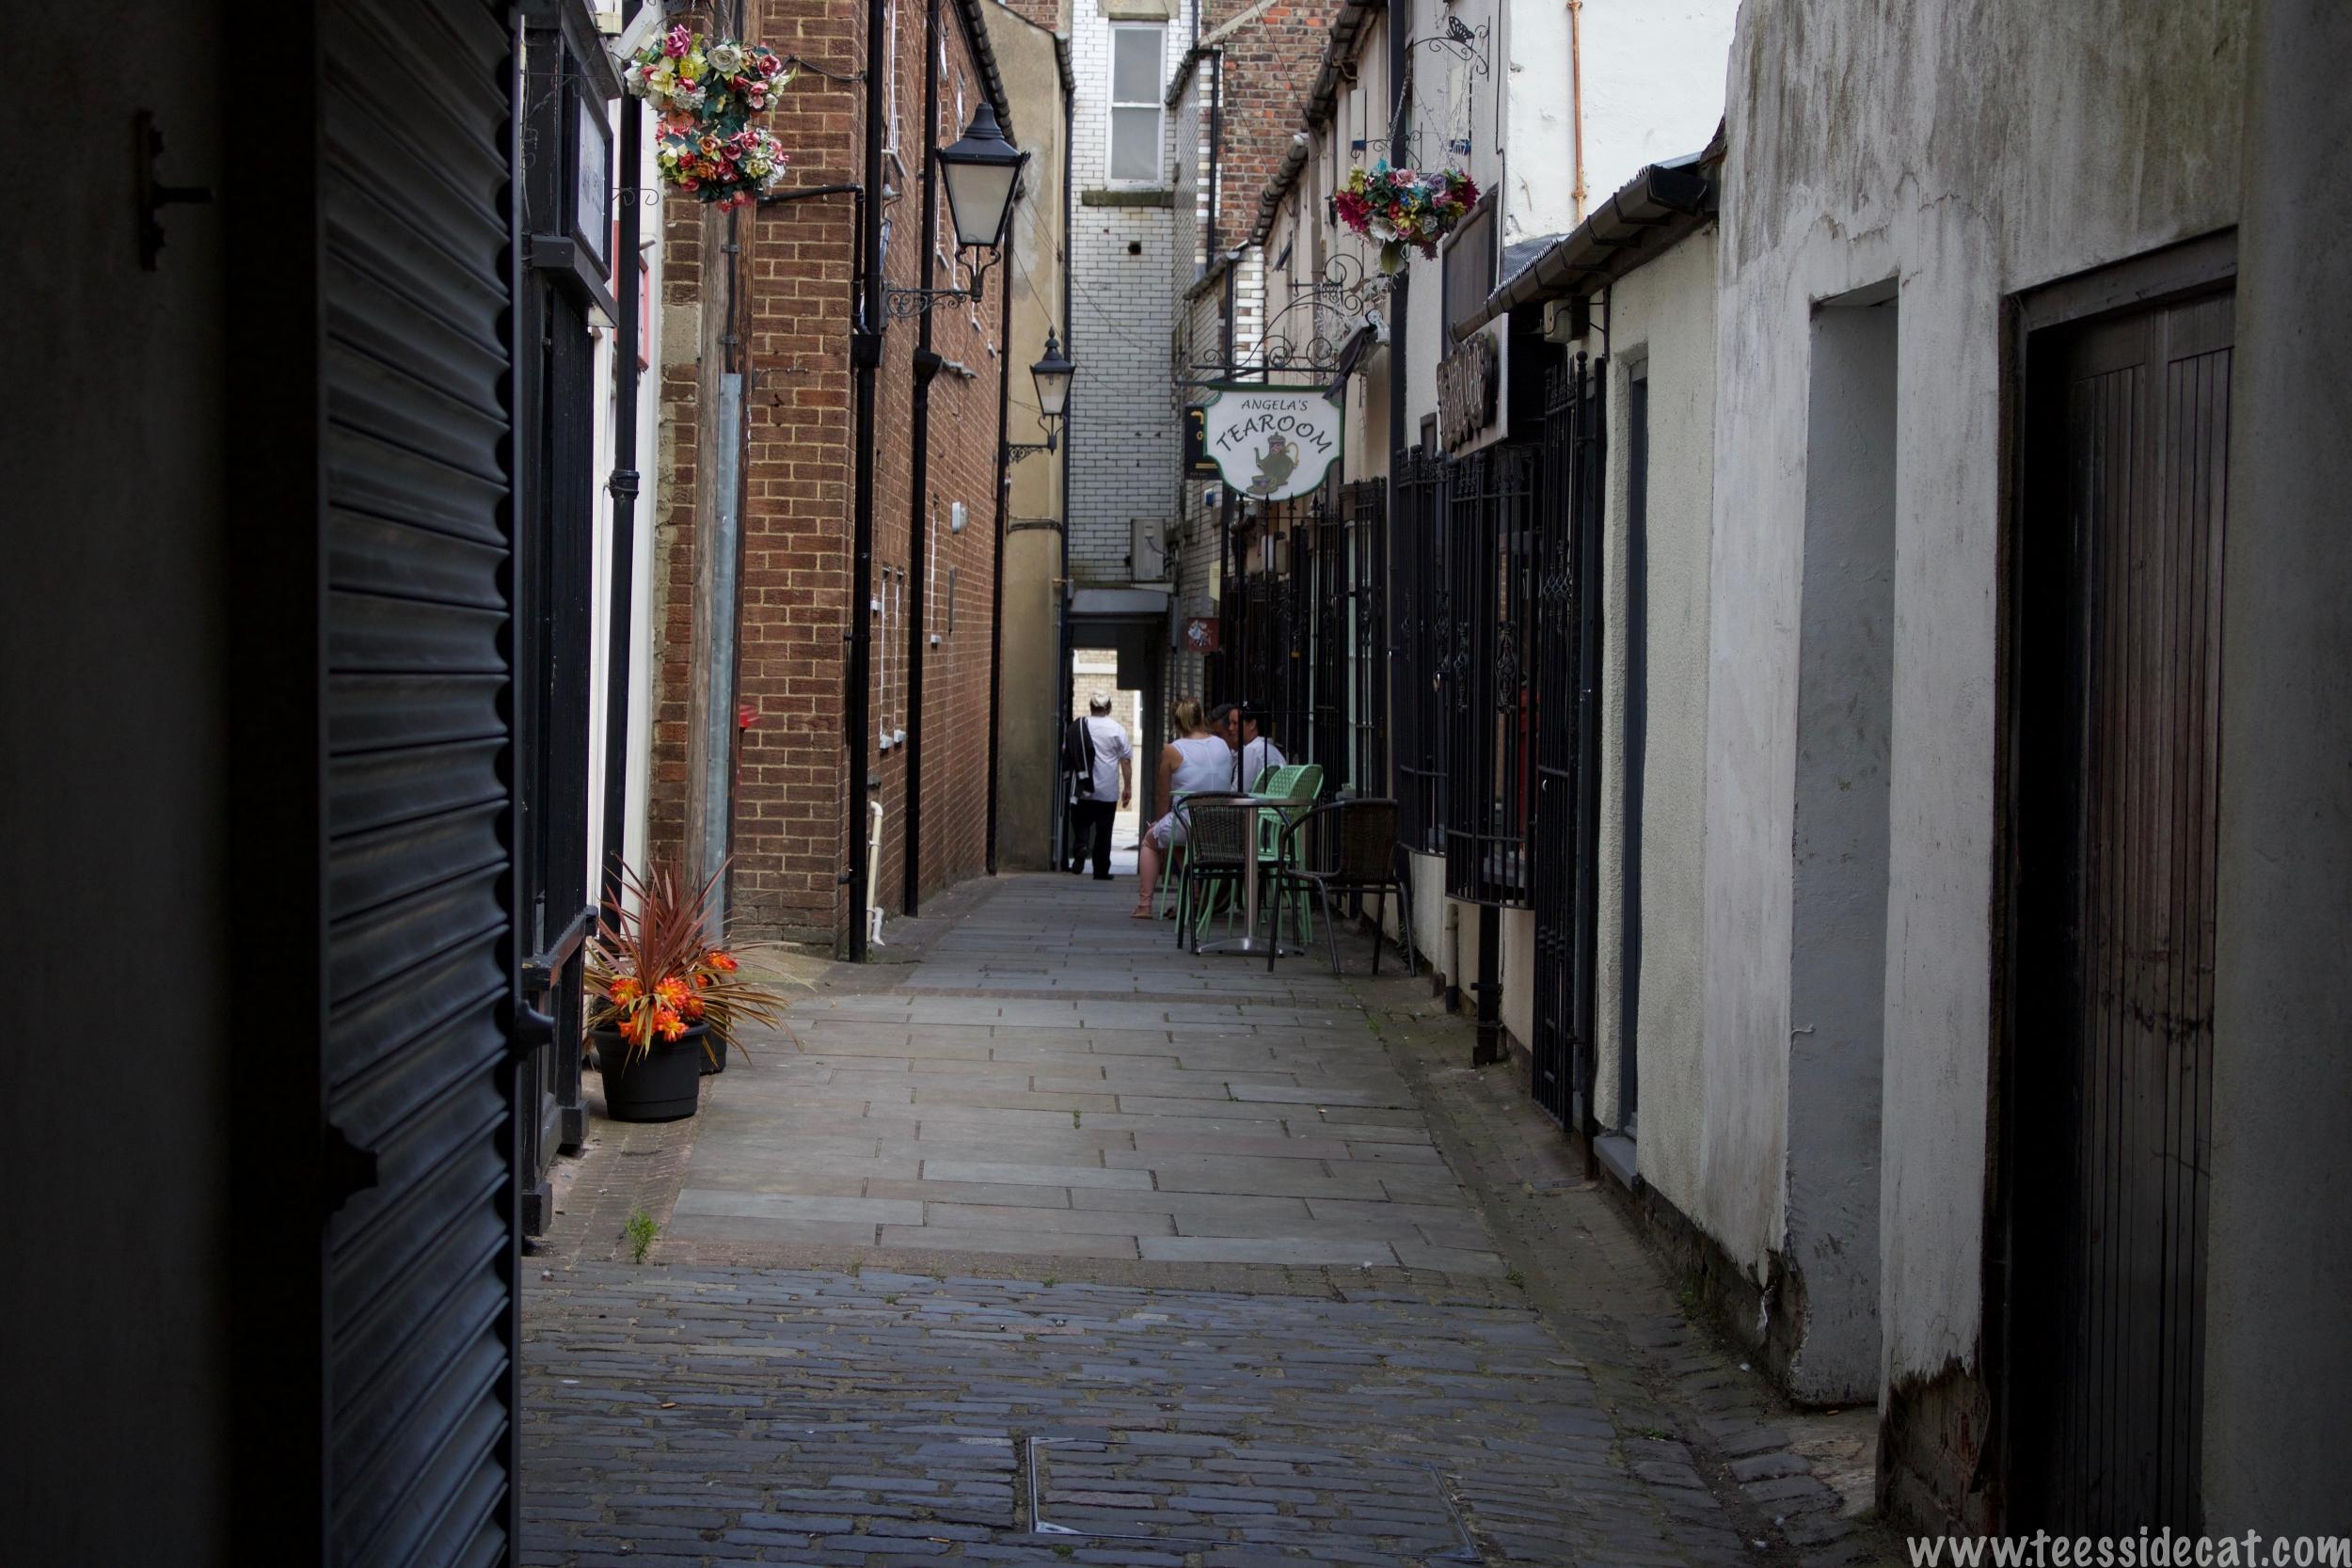 One of Stockton's best alleyways